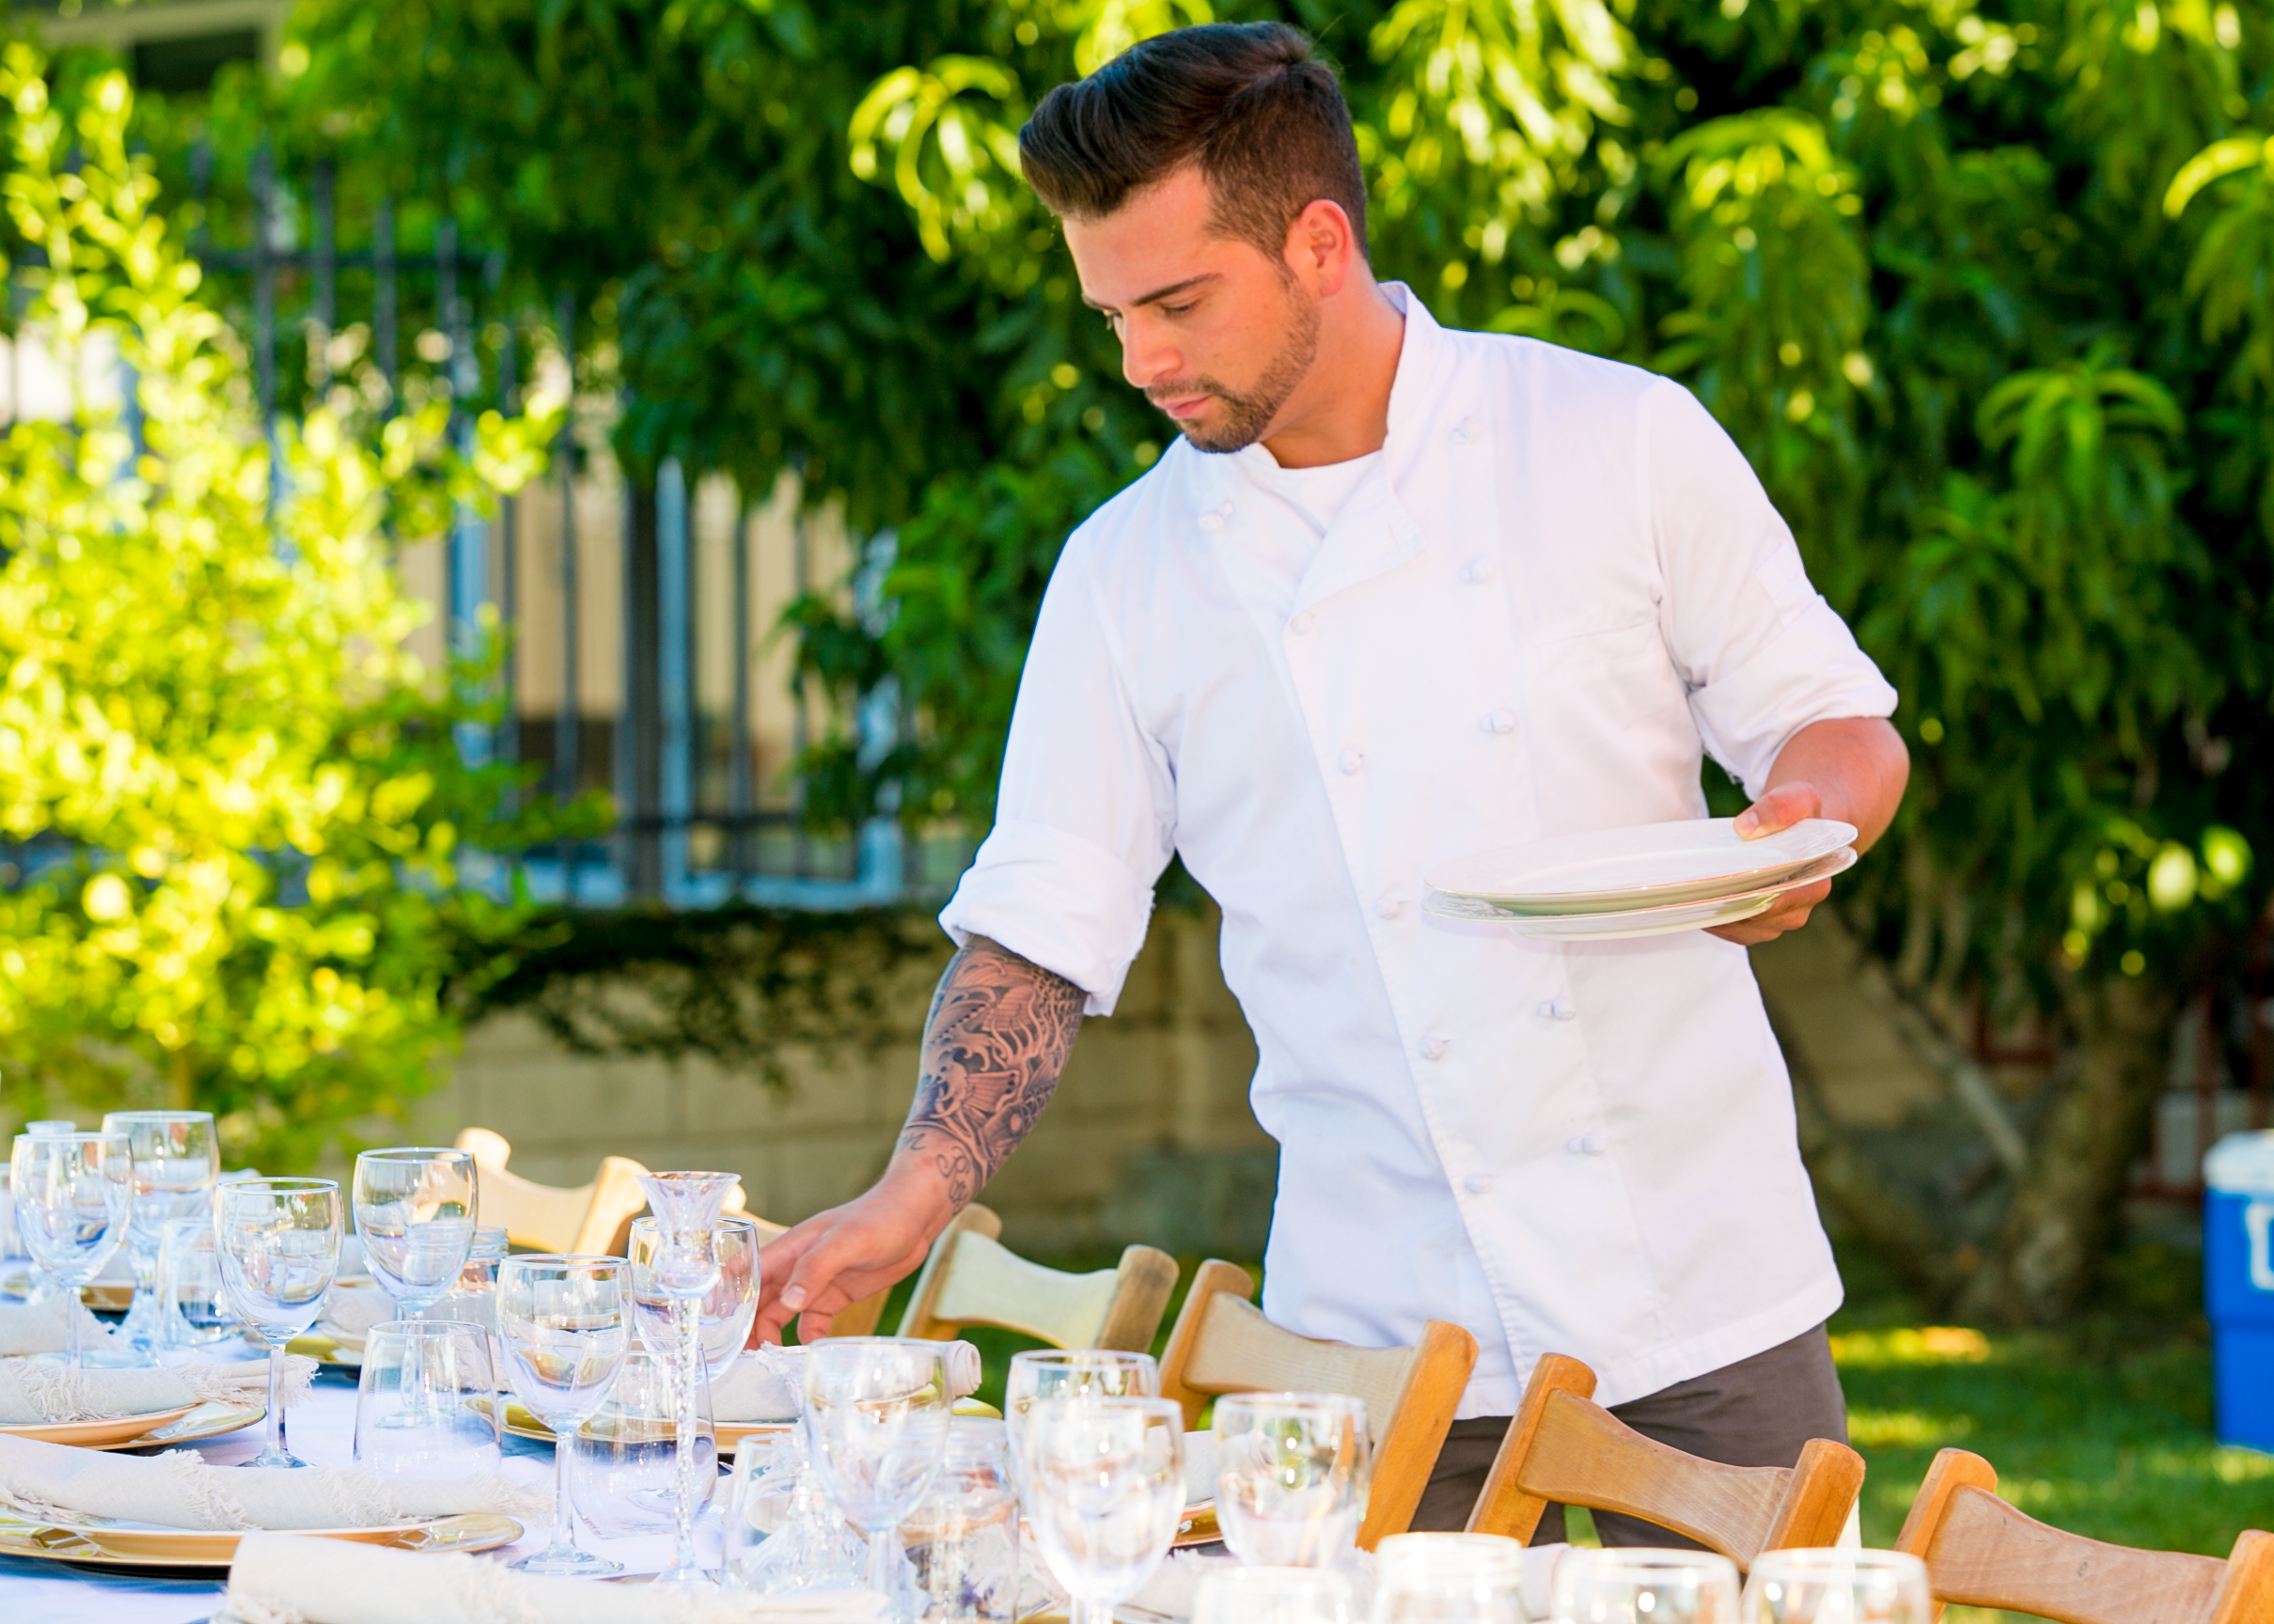 Chef Steven table setting